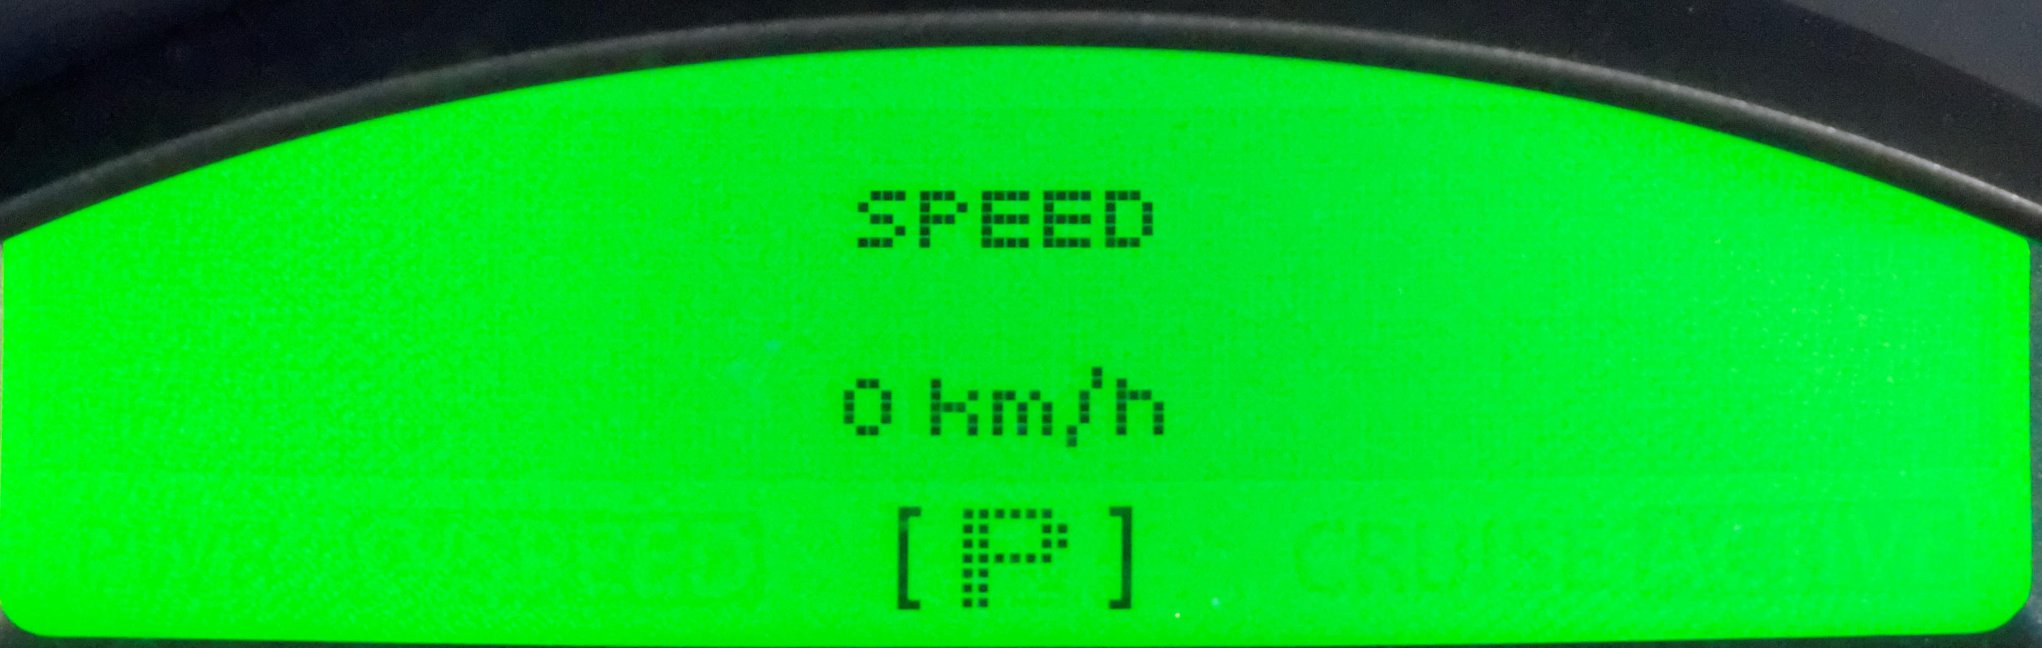 Trip-computer-17.jpeg